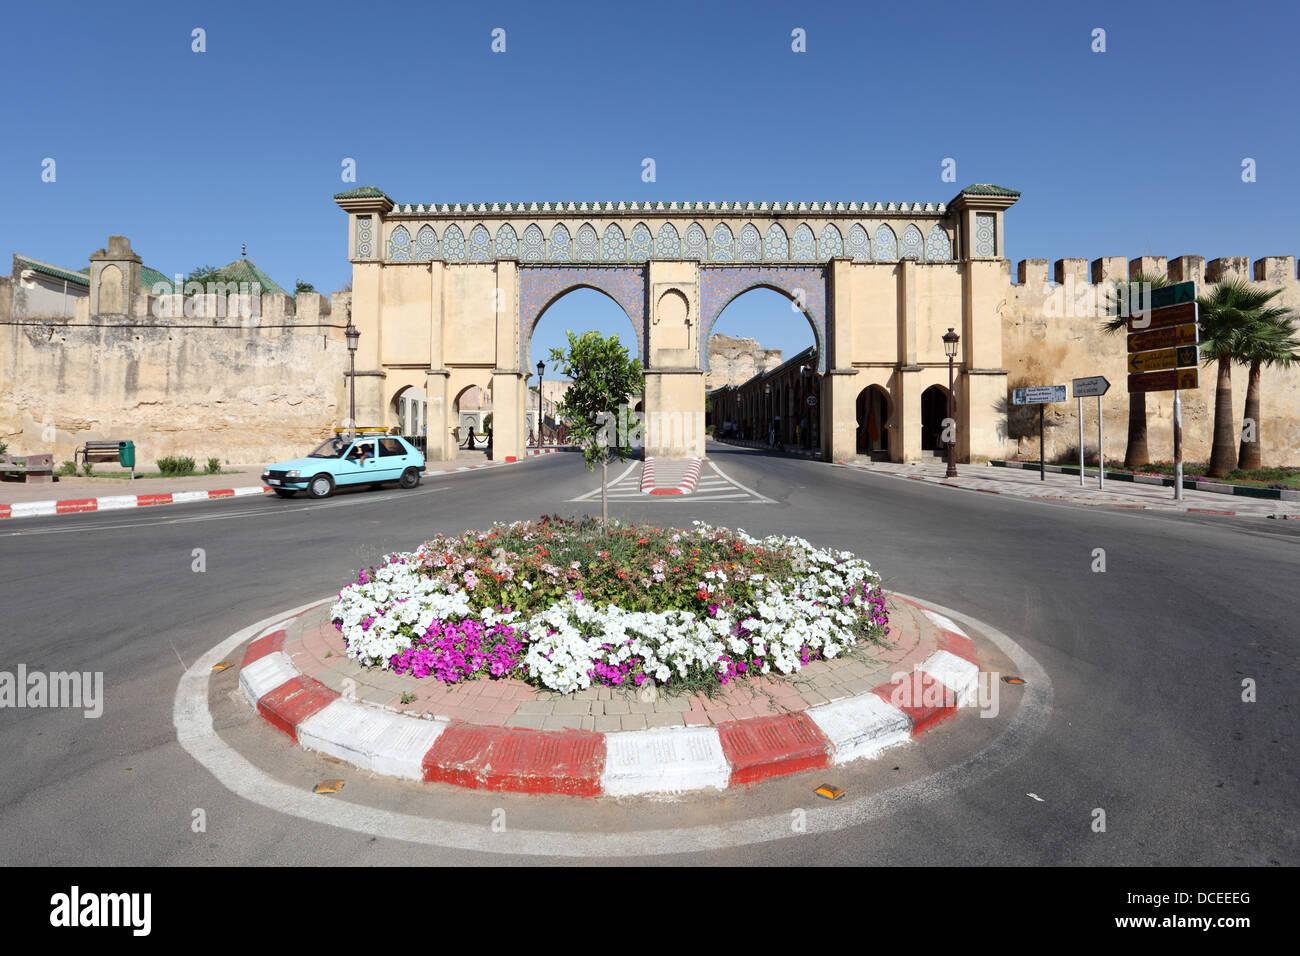 Kreisverkehr mit Blumen in Meknès, Marokko Stockbild